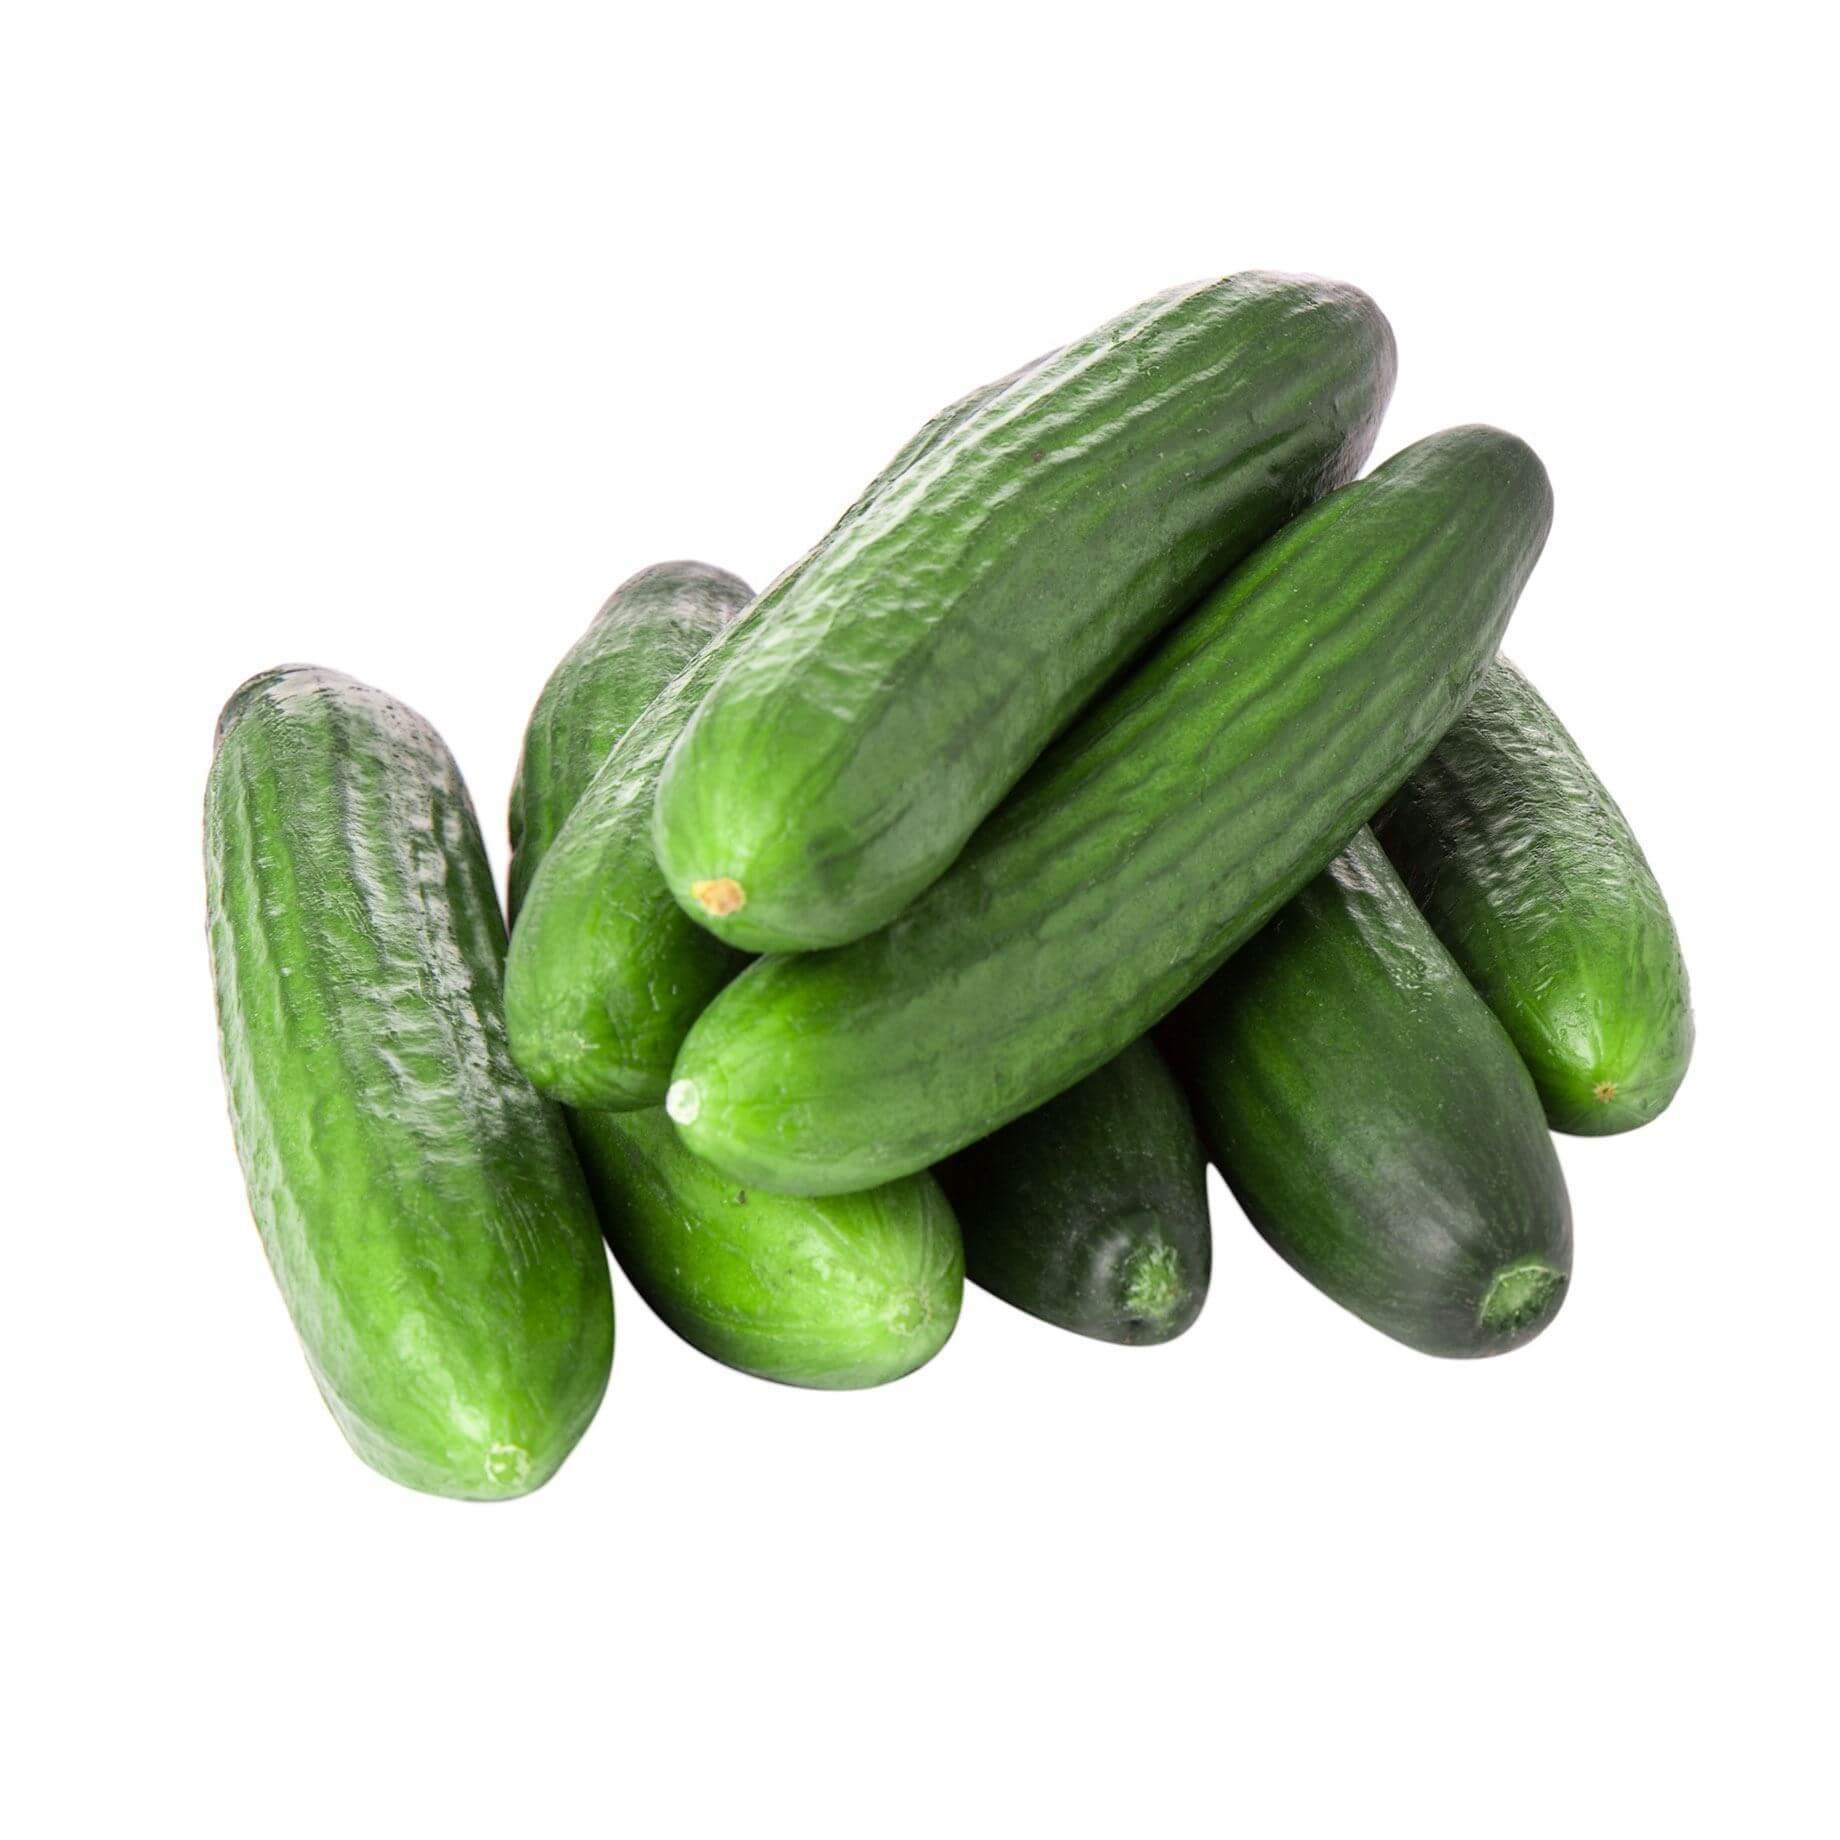 Cucumber Fresh Local 1 Kg